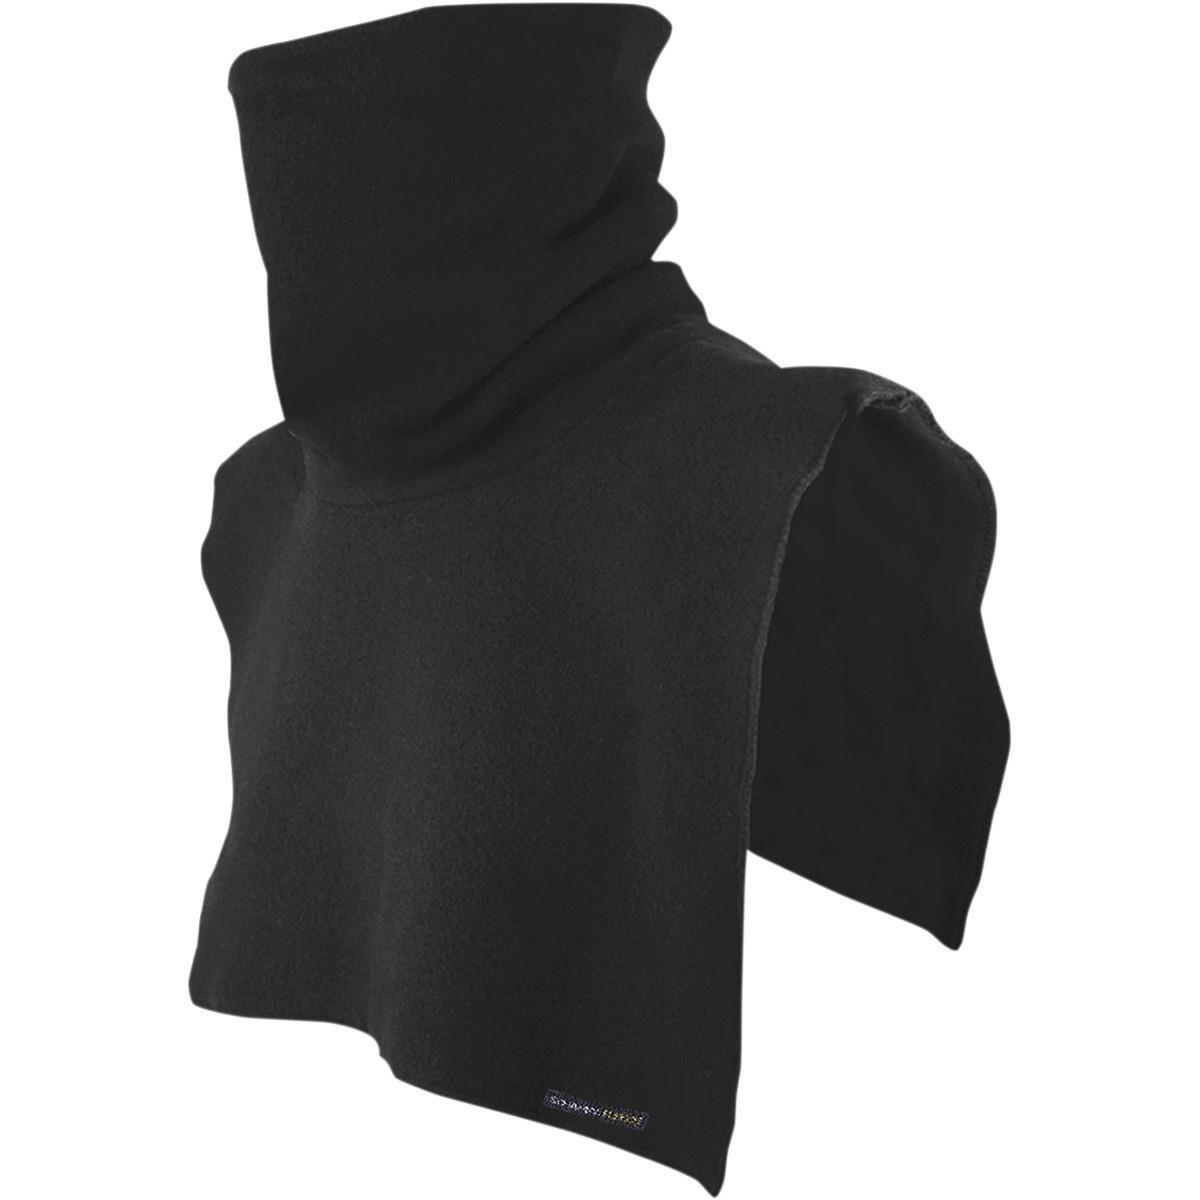 Schampa Original Tall Neck Dickie (Black, One Size) TD002 tr-501144